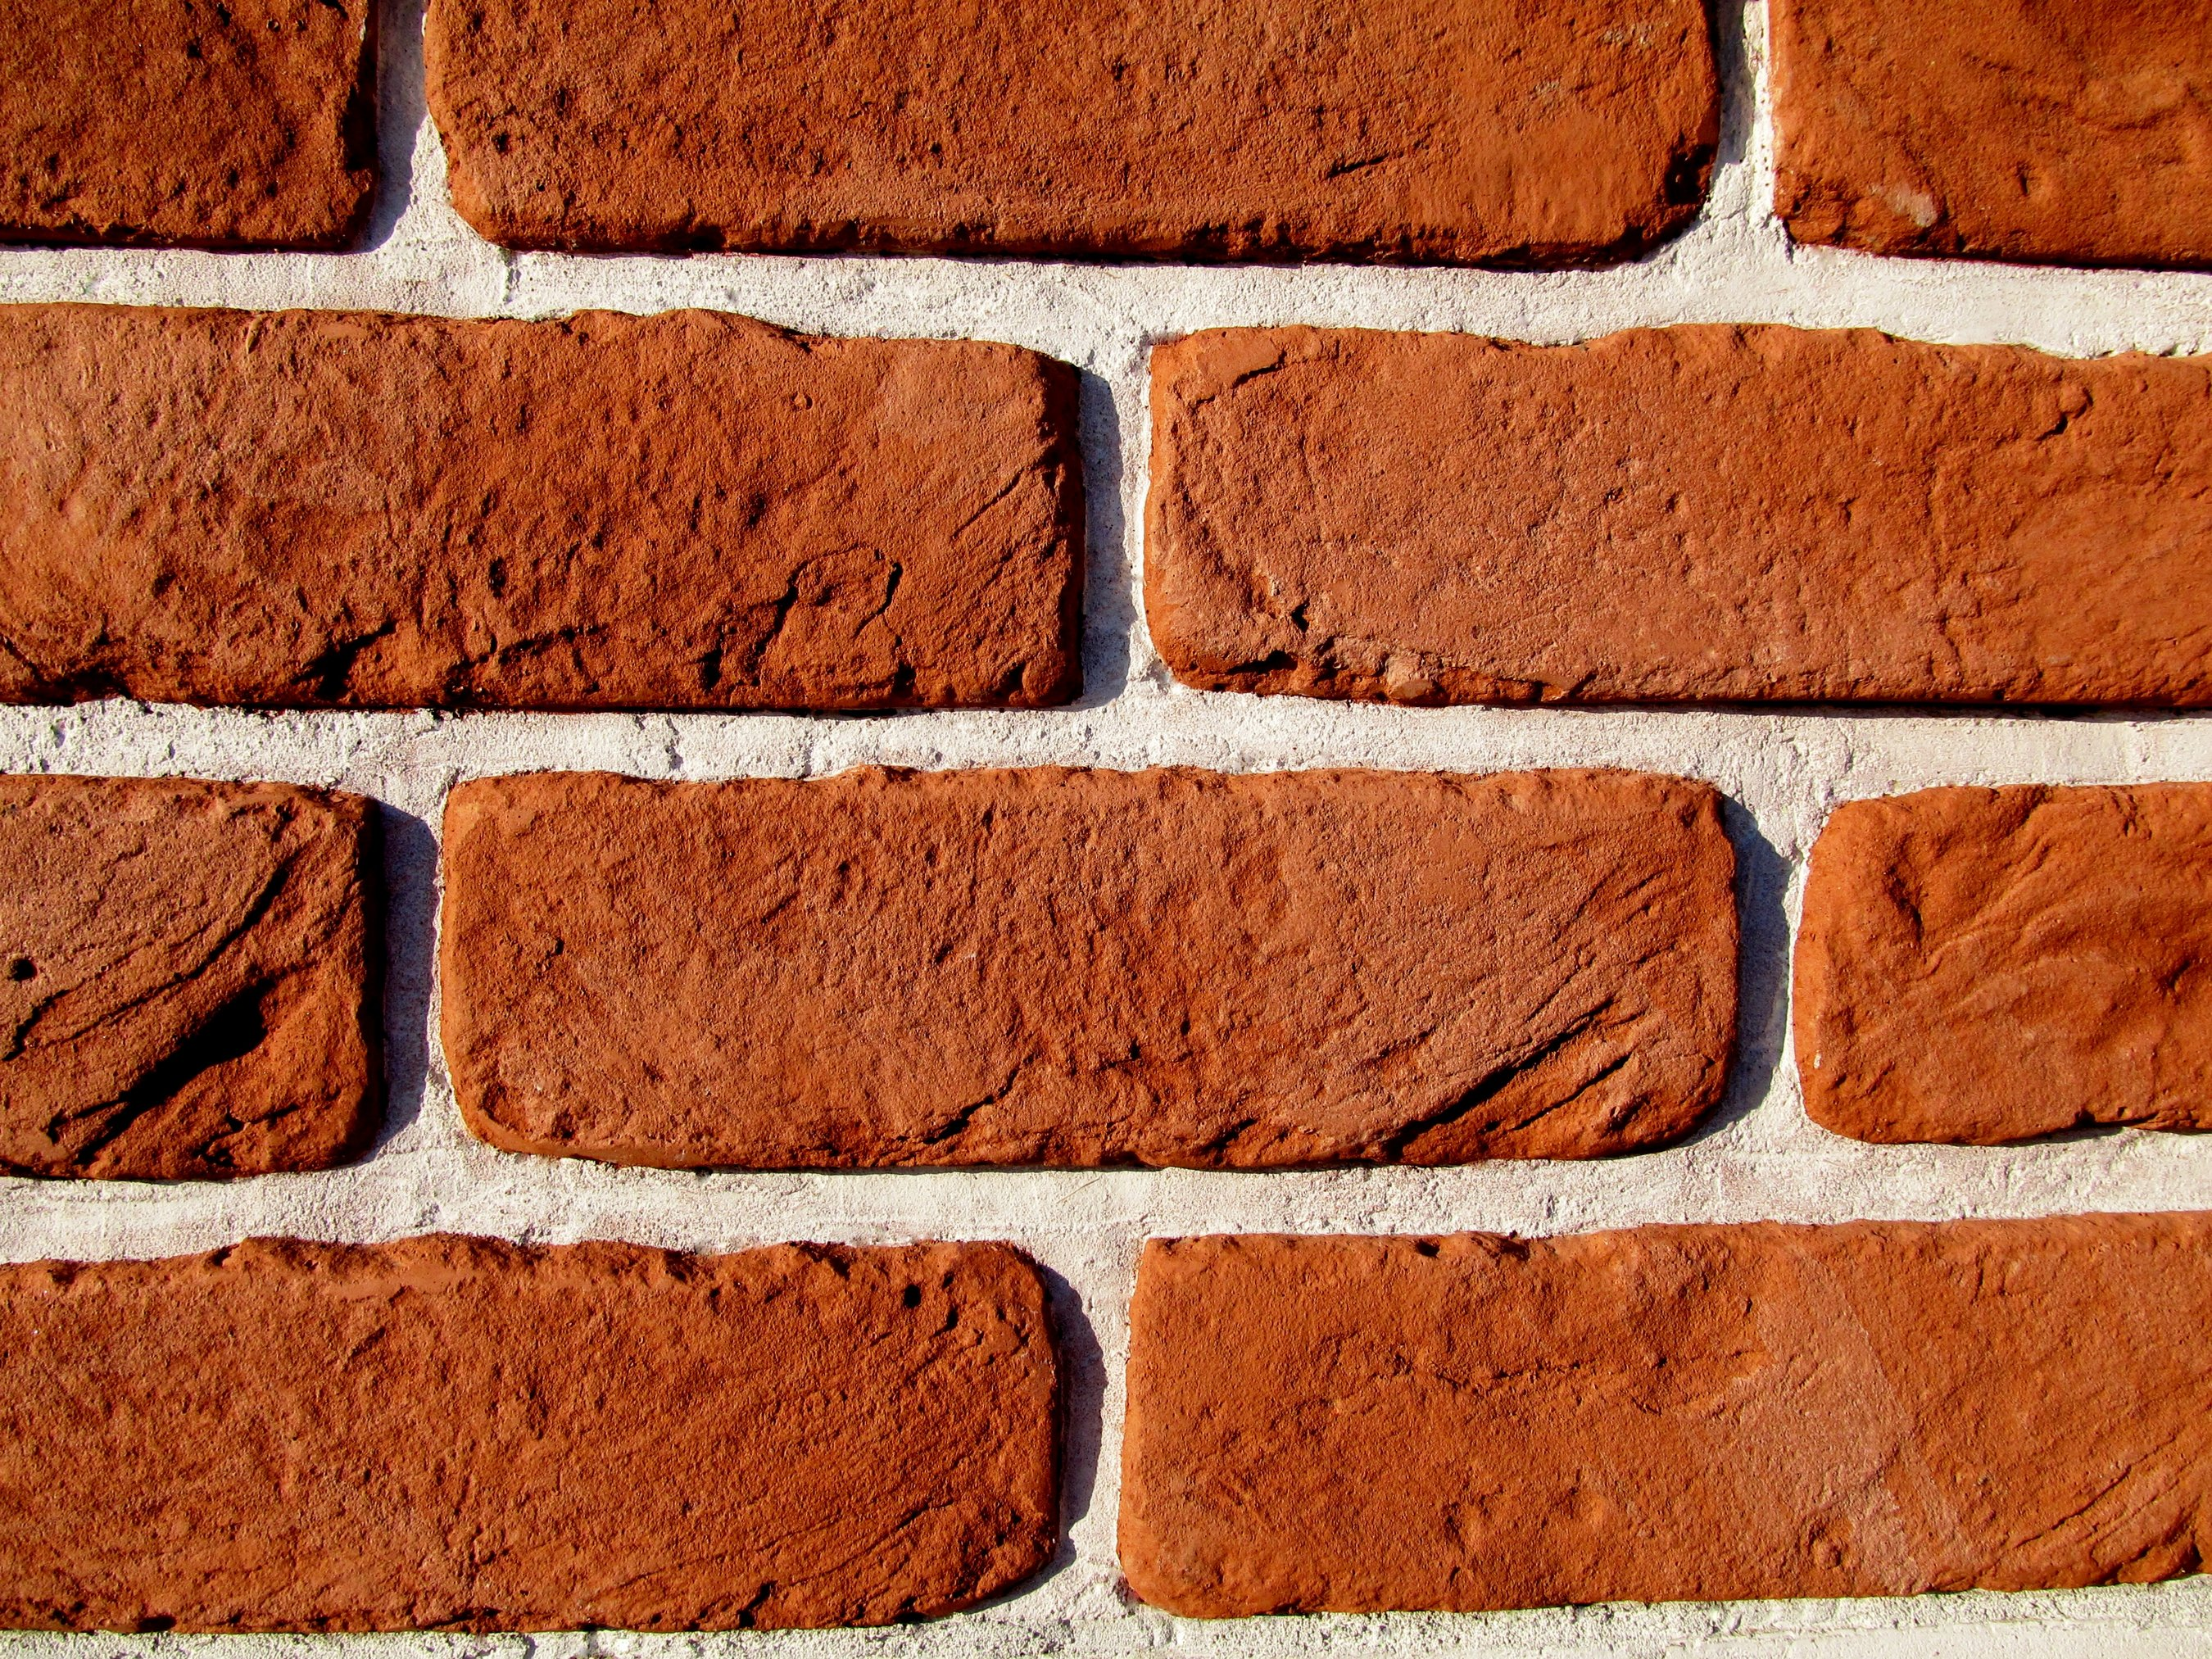 Нажмите на изображение для увеличения Название: Фото панели бетонного забора старый кирпич.jpg Просмотров: 47 Размер:1.98 Мб ID:333661